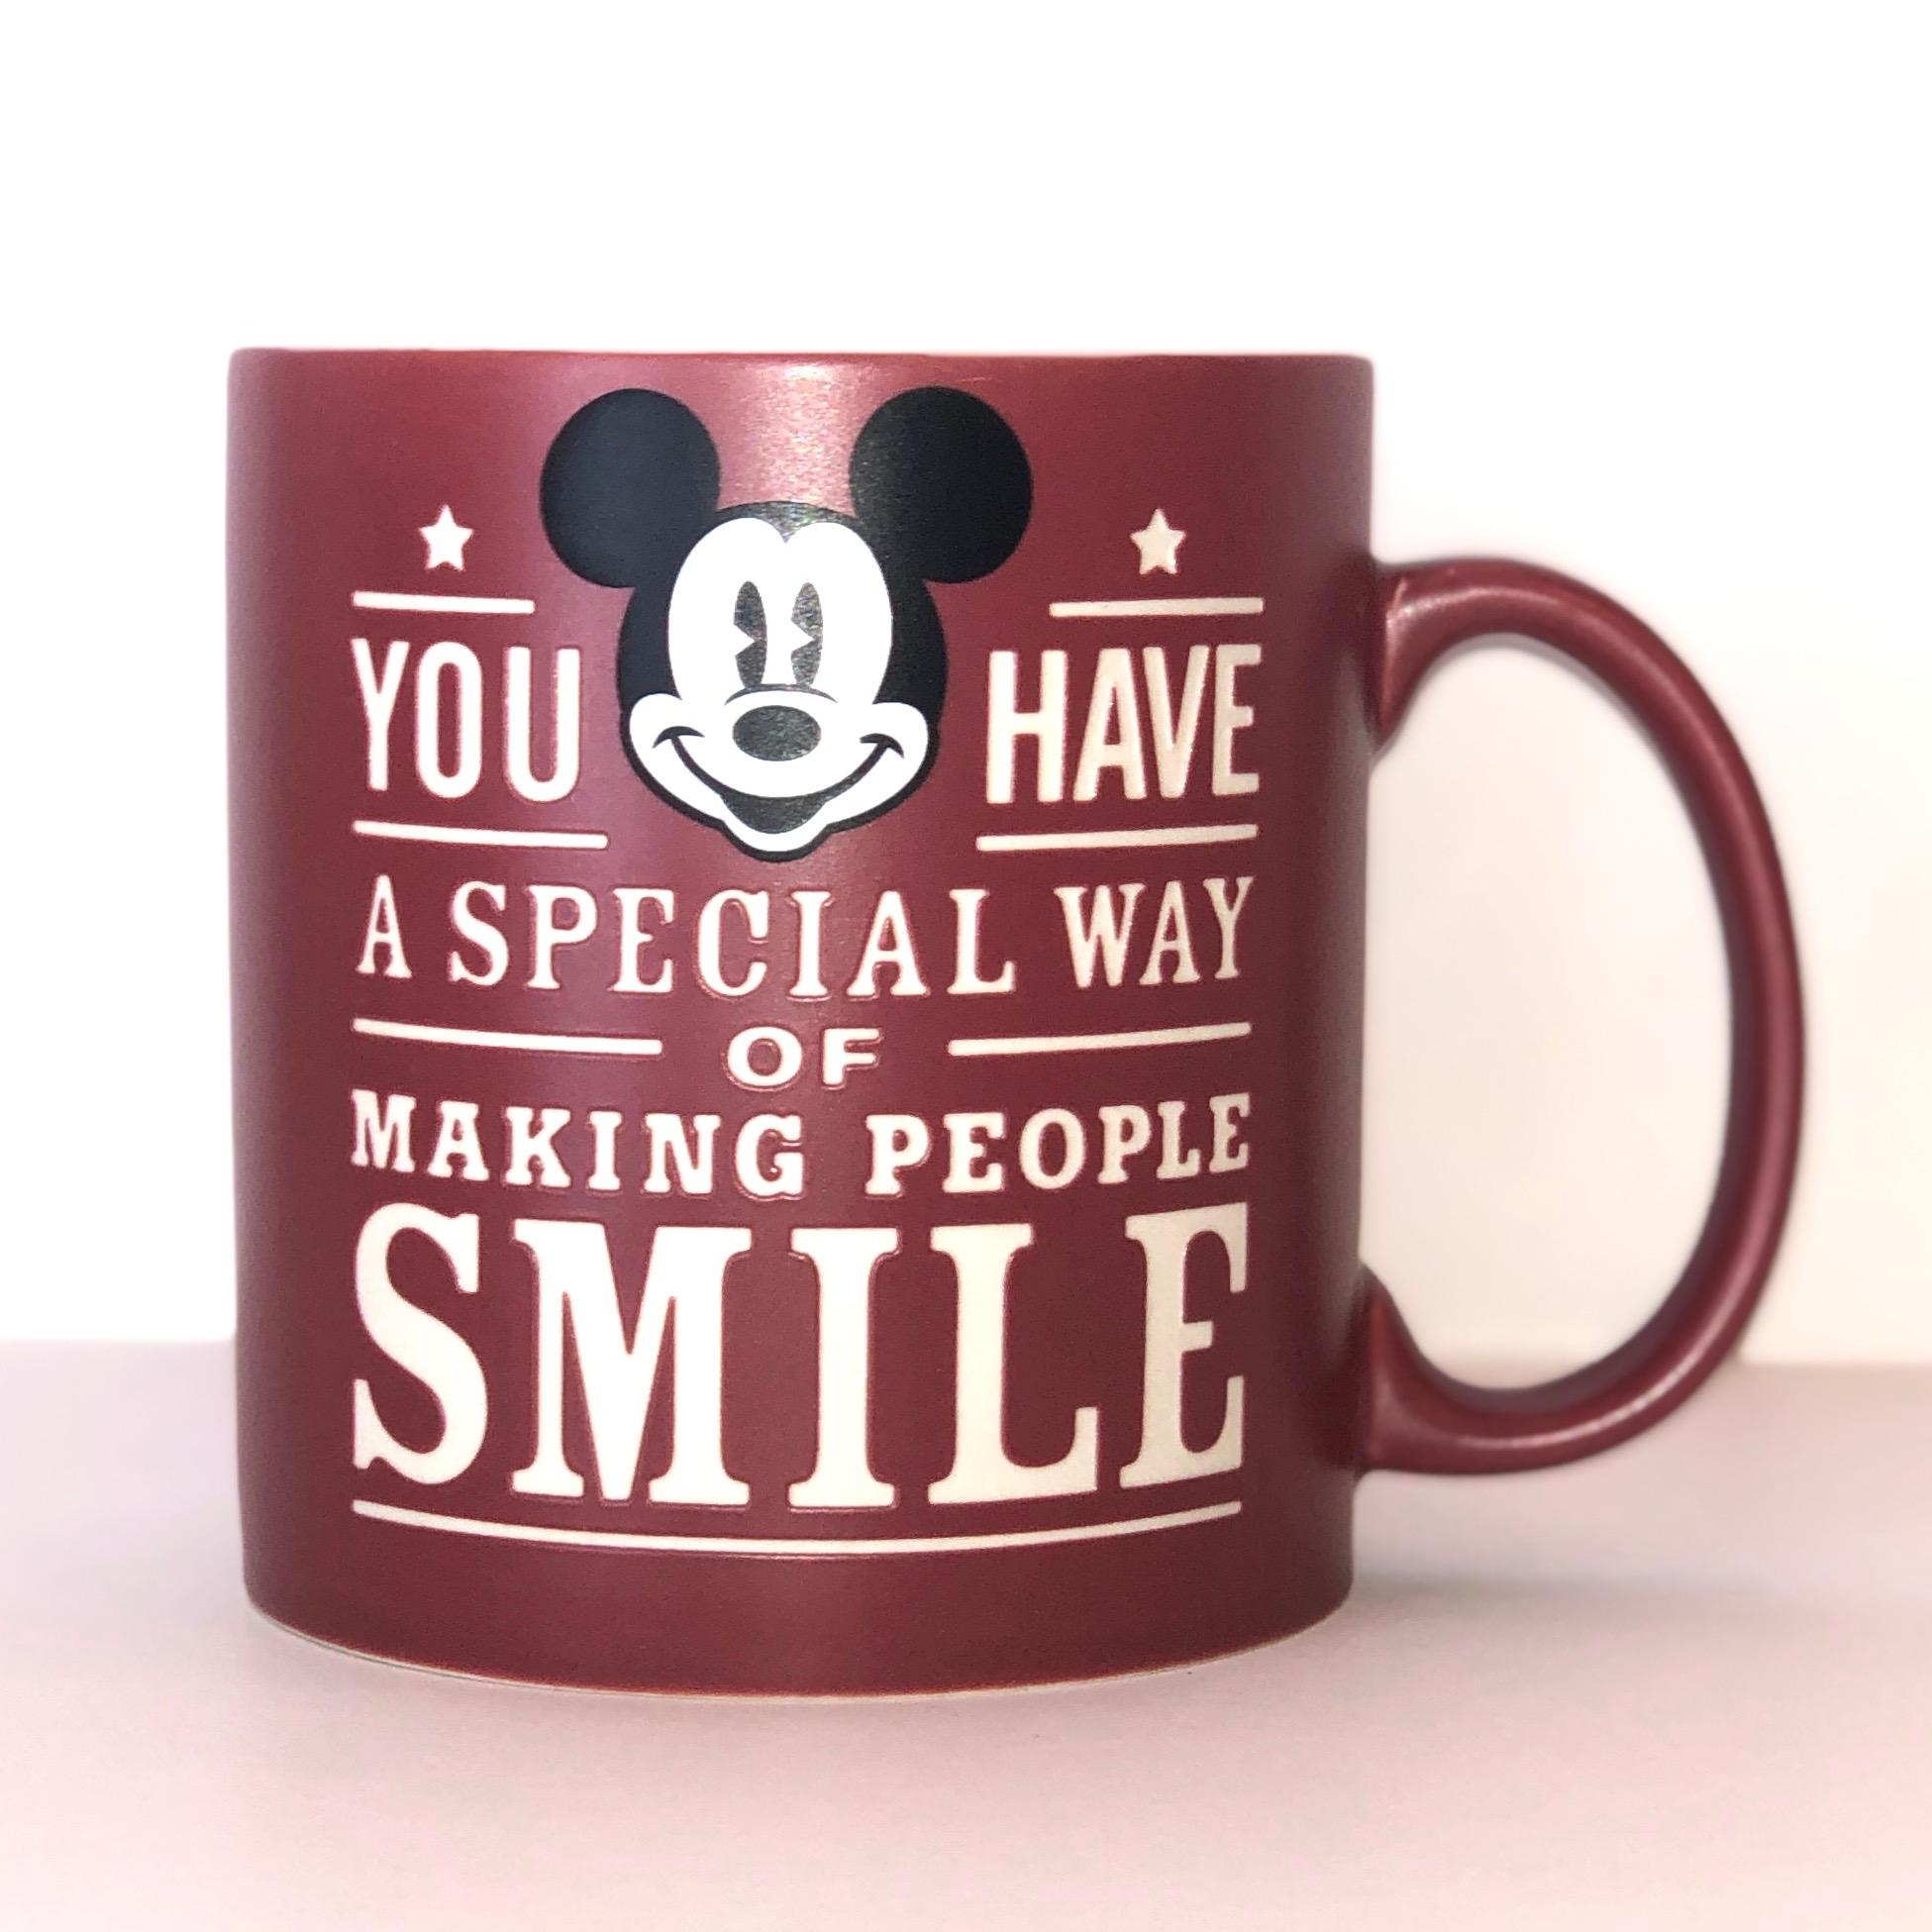 Leroy's favorite Disney mug that he rarely uses.